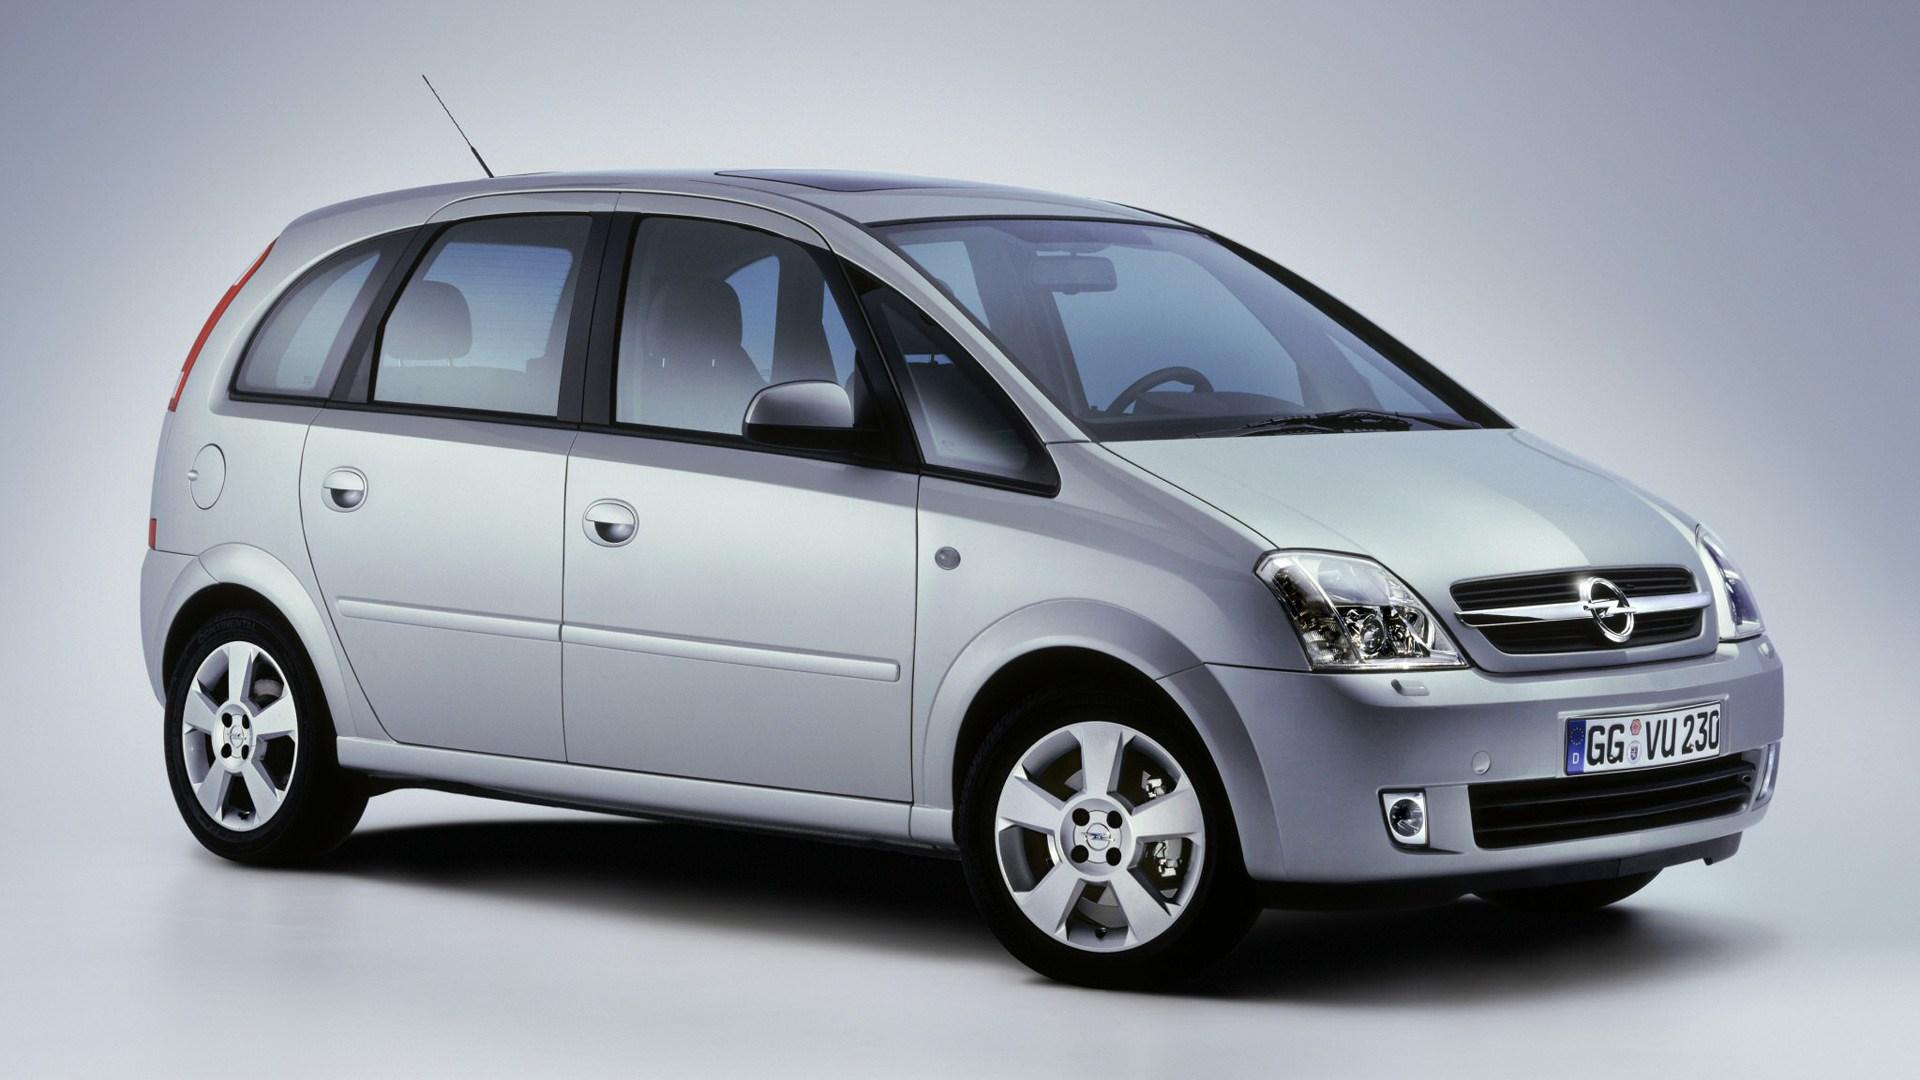 Coche del día: Opel Meriva 1.6 XE